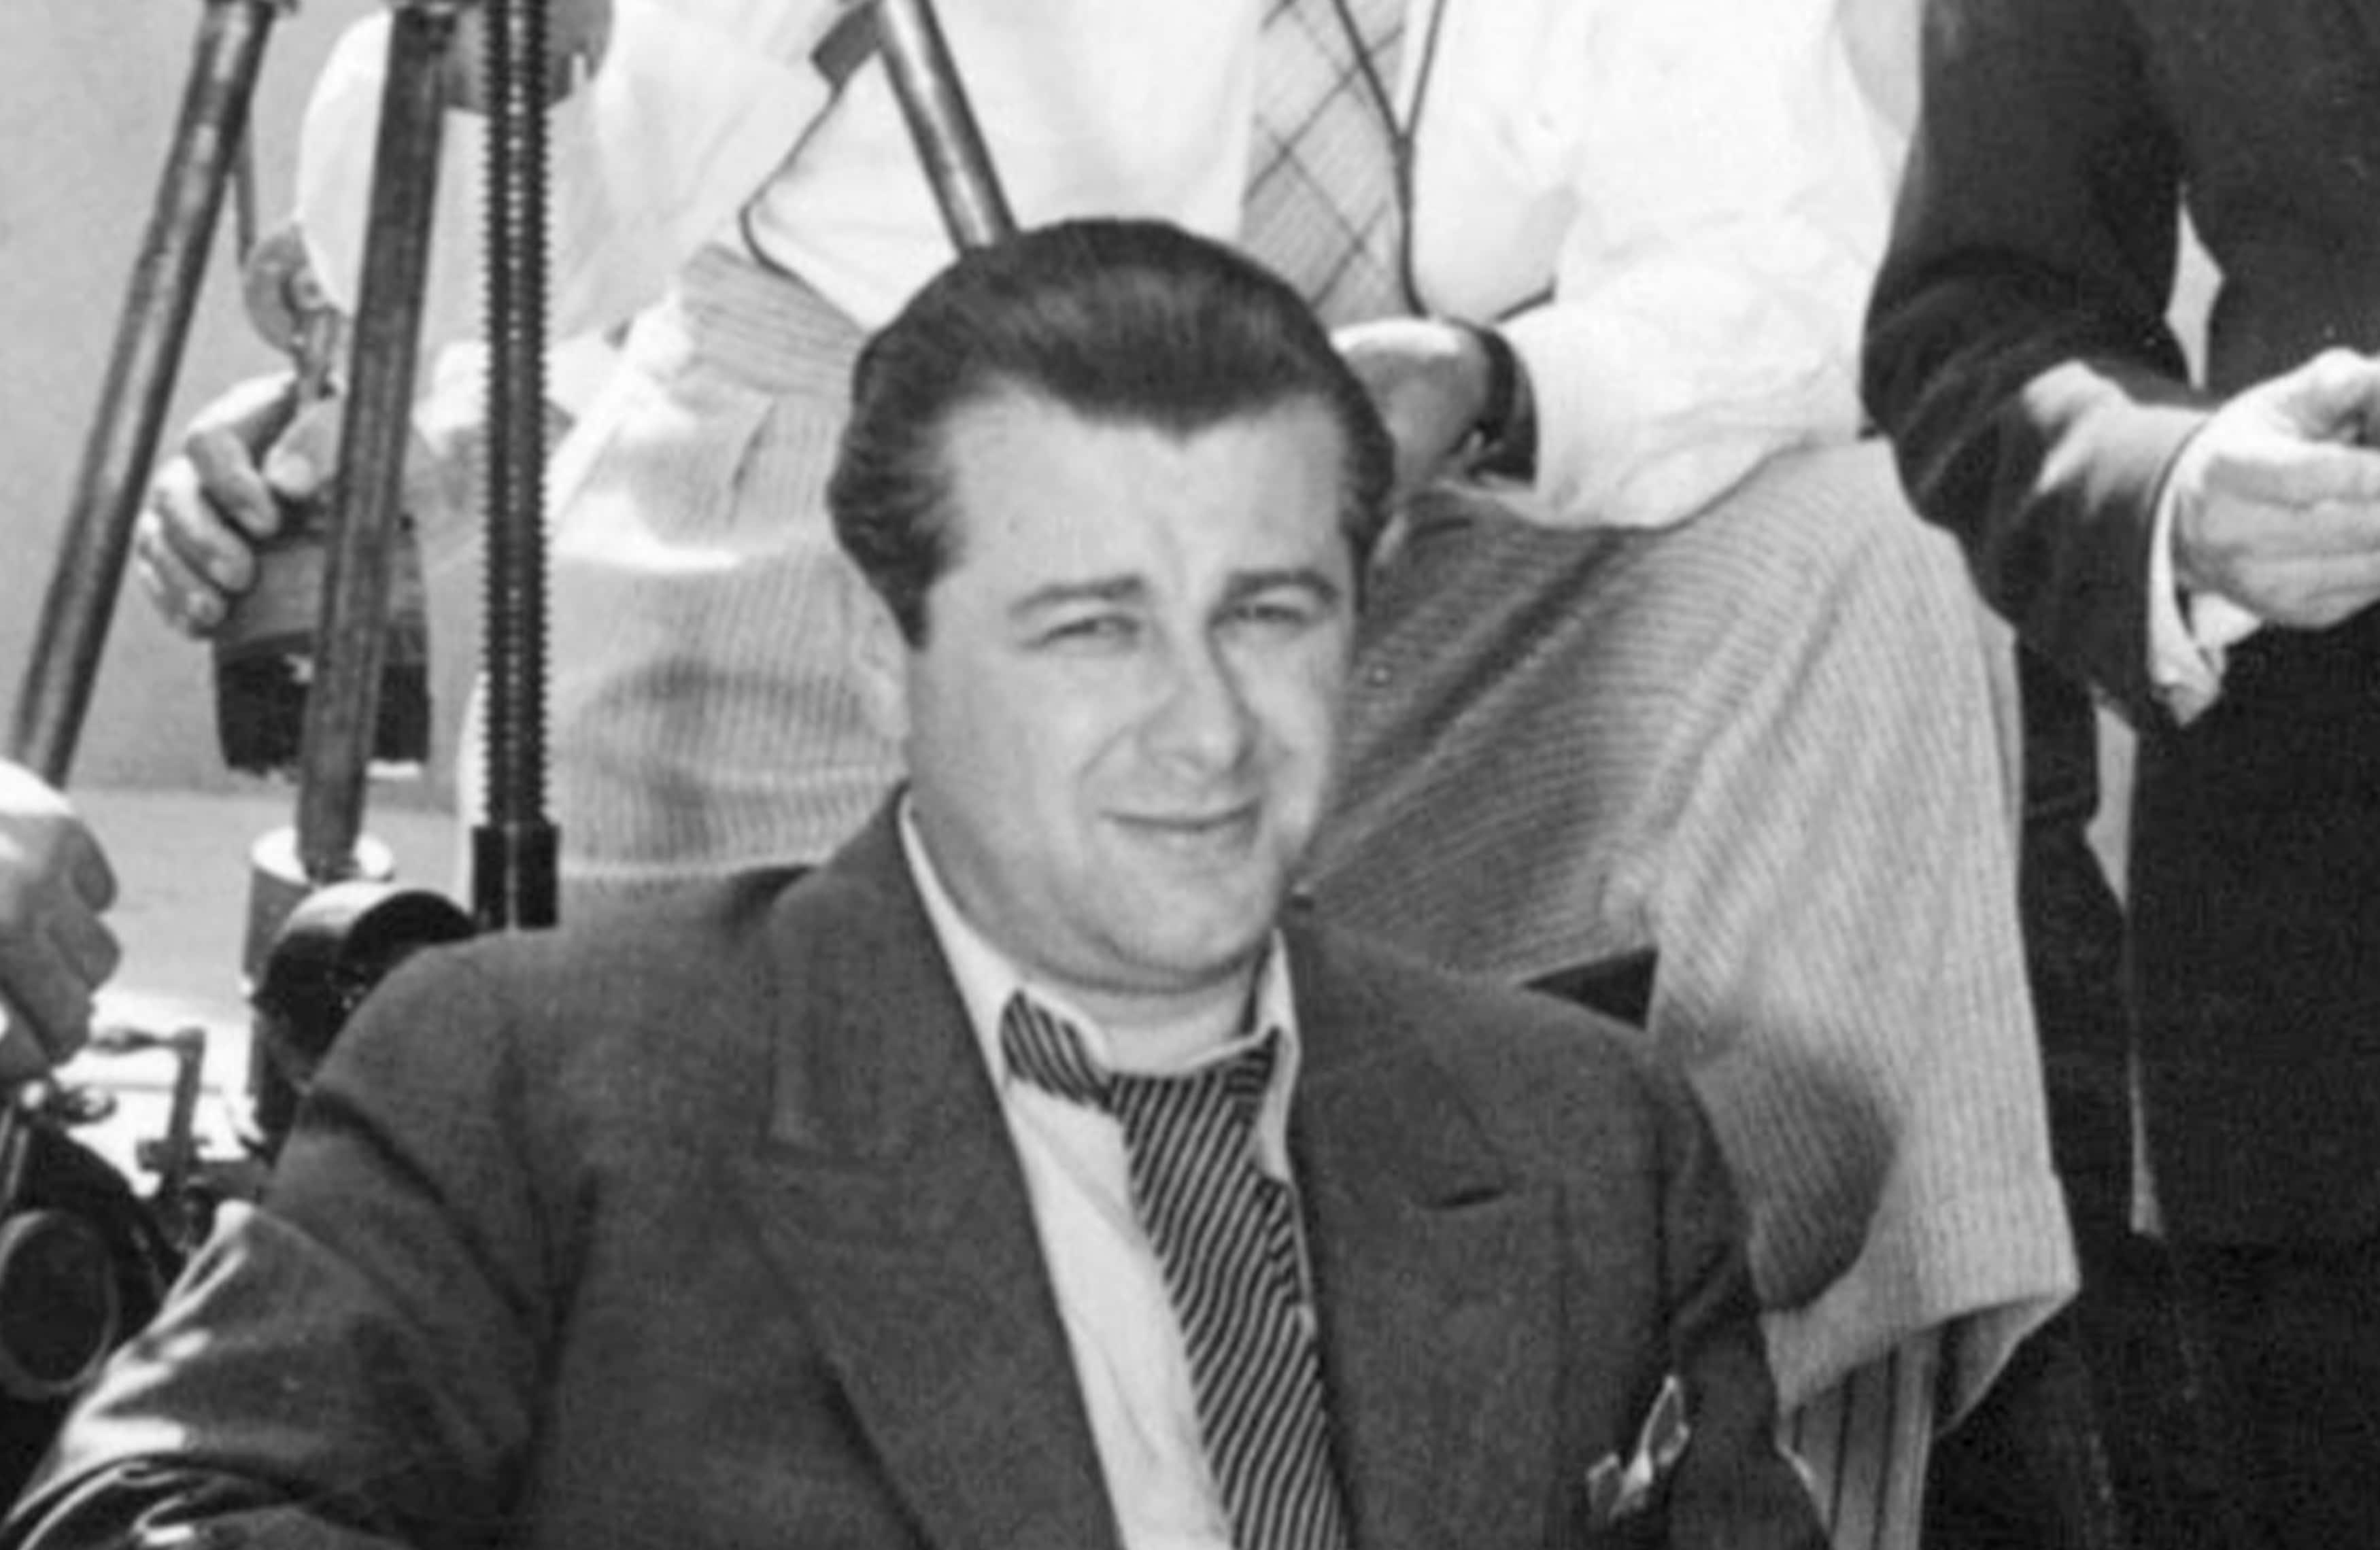 Ralph Staub